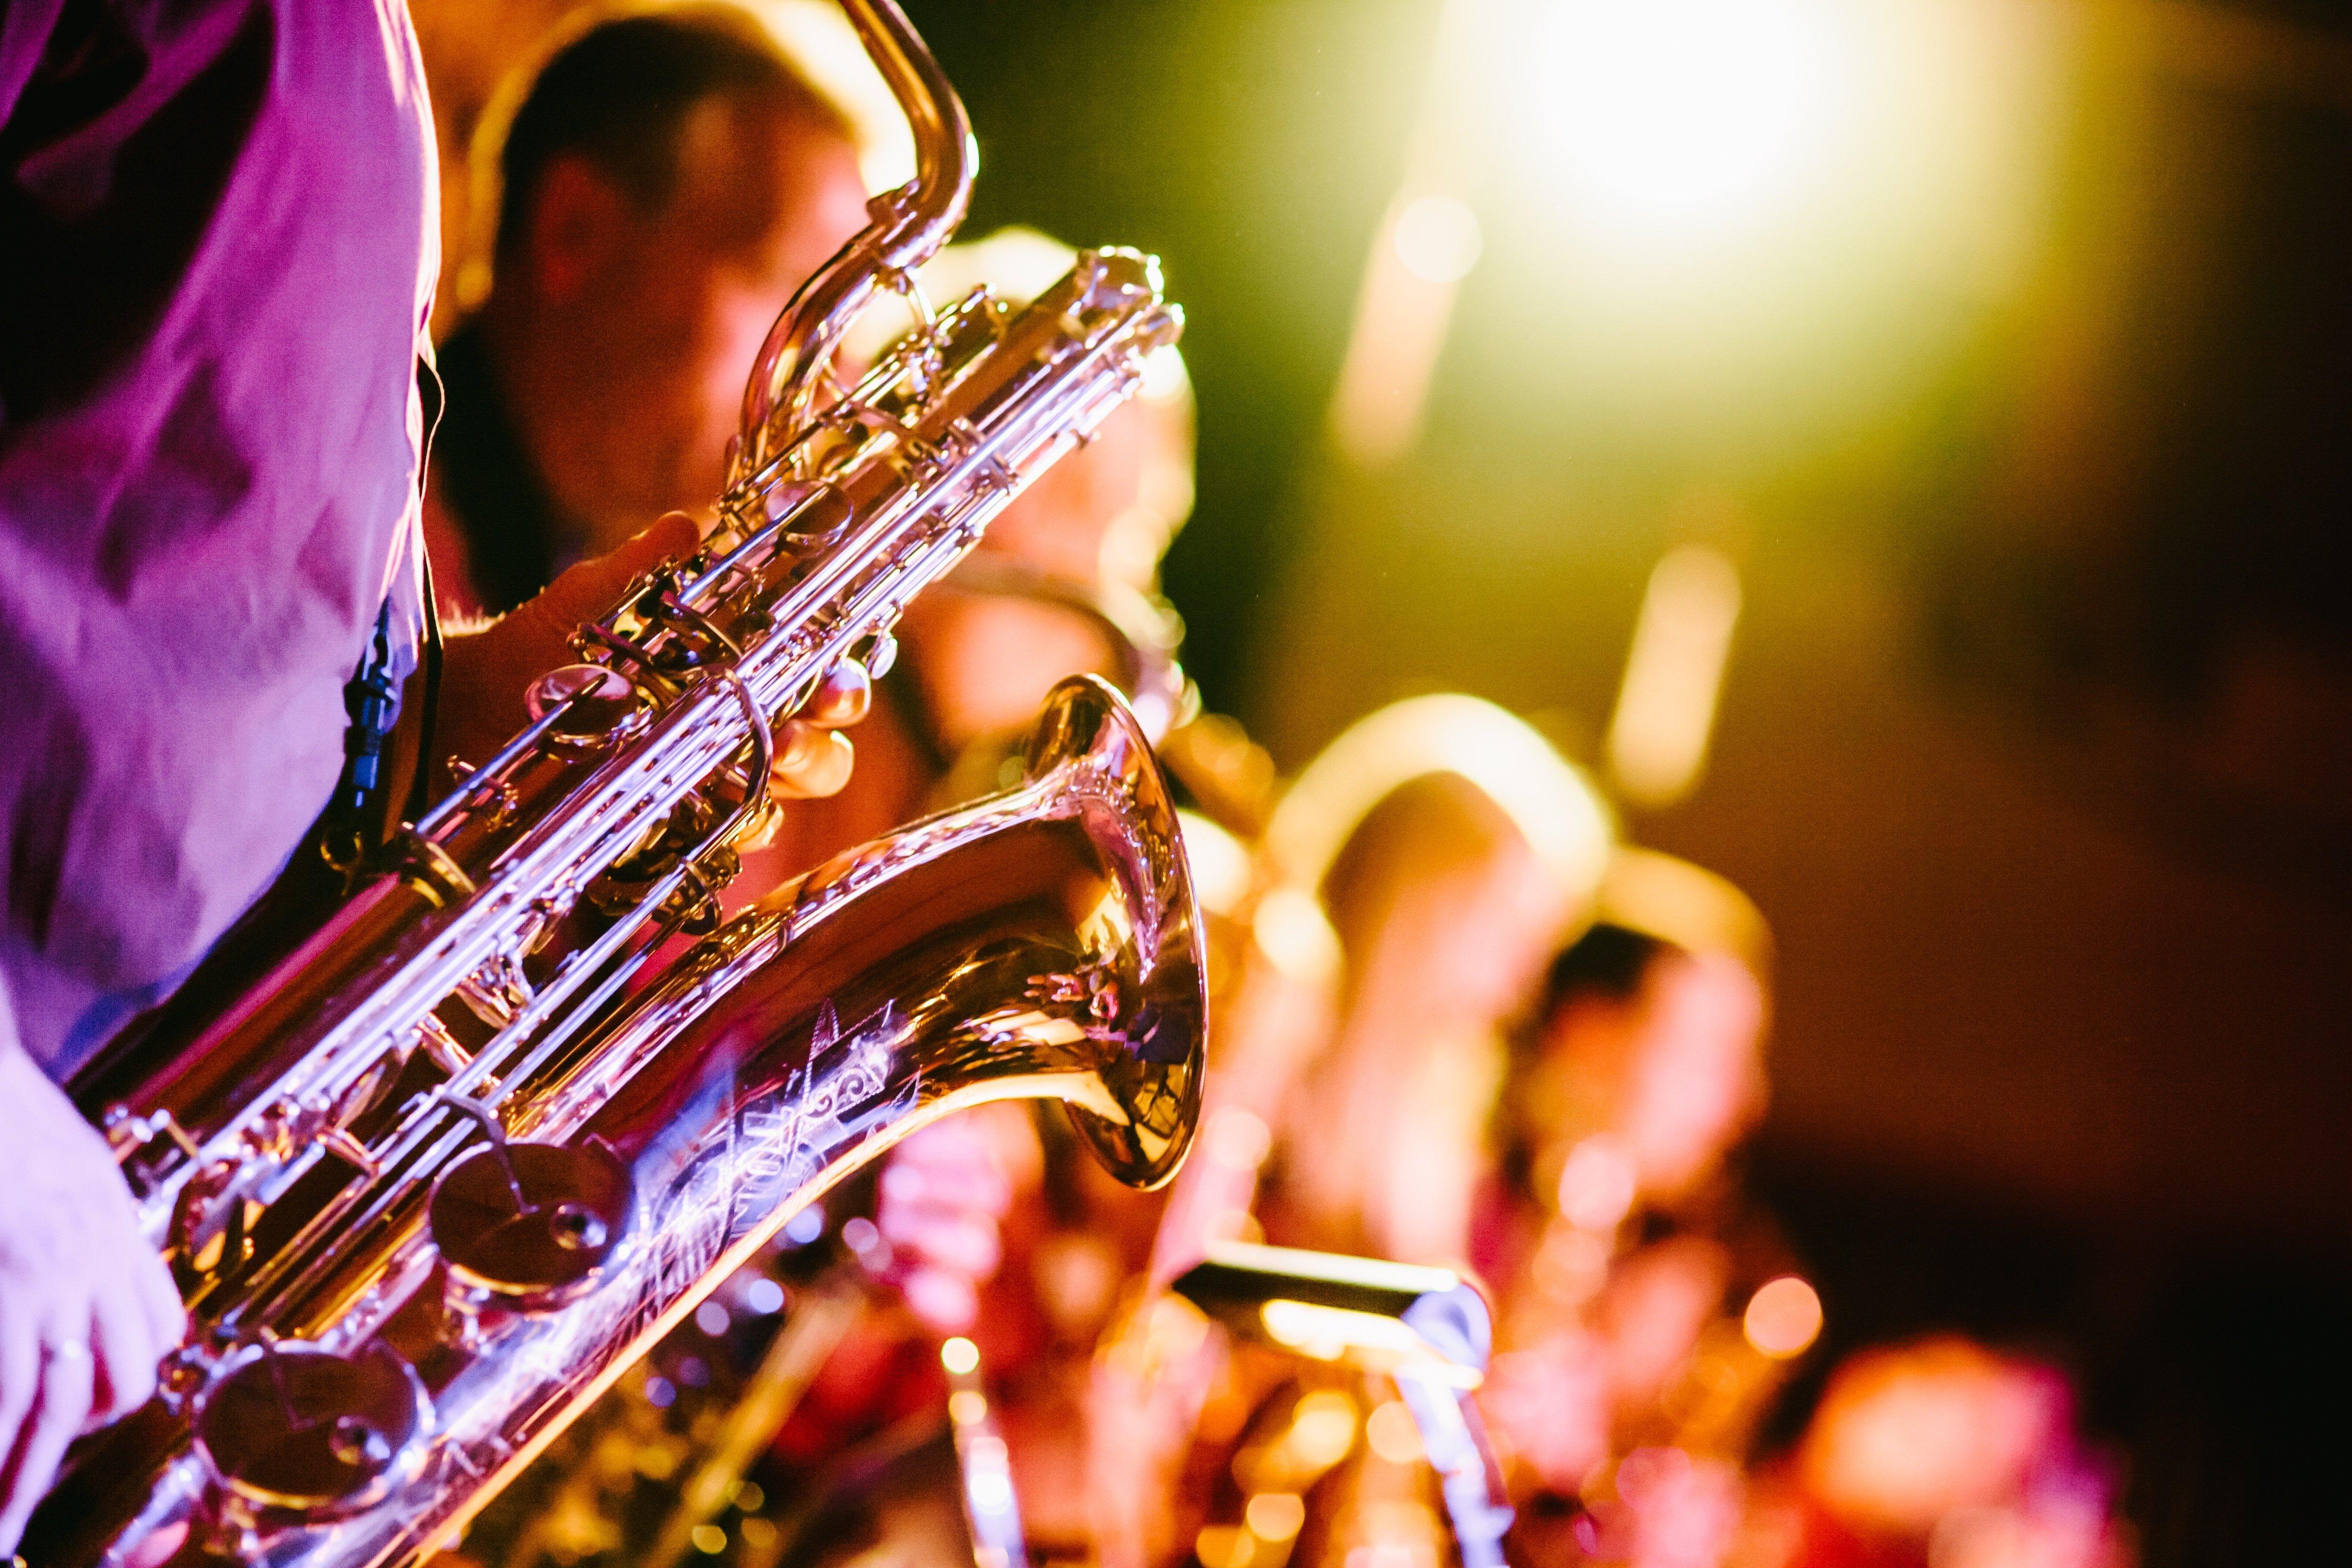 La Jazzset Orchestra suona per i quartieri veronesi